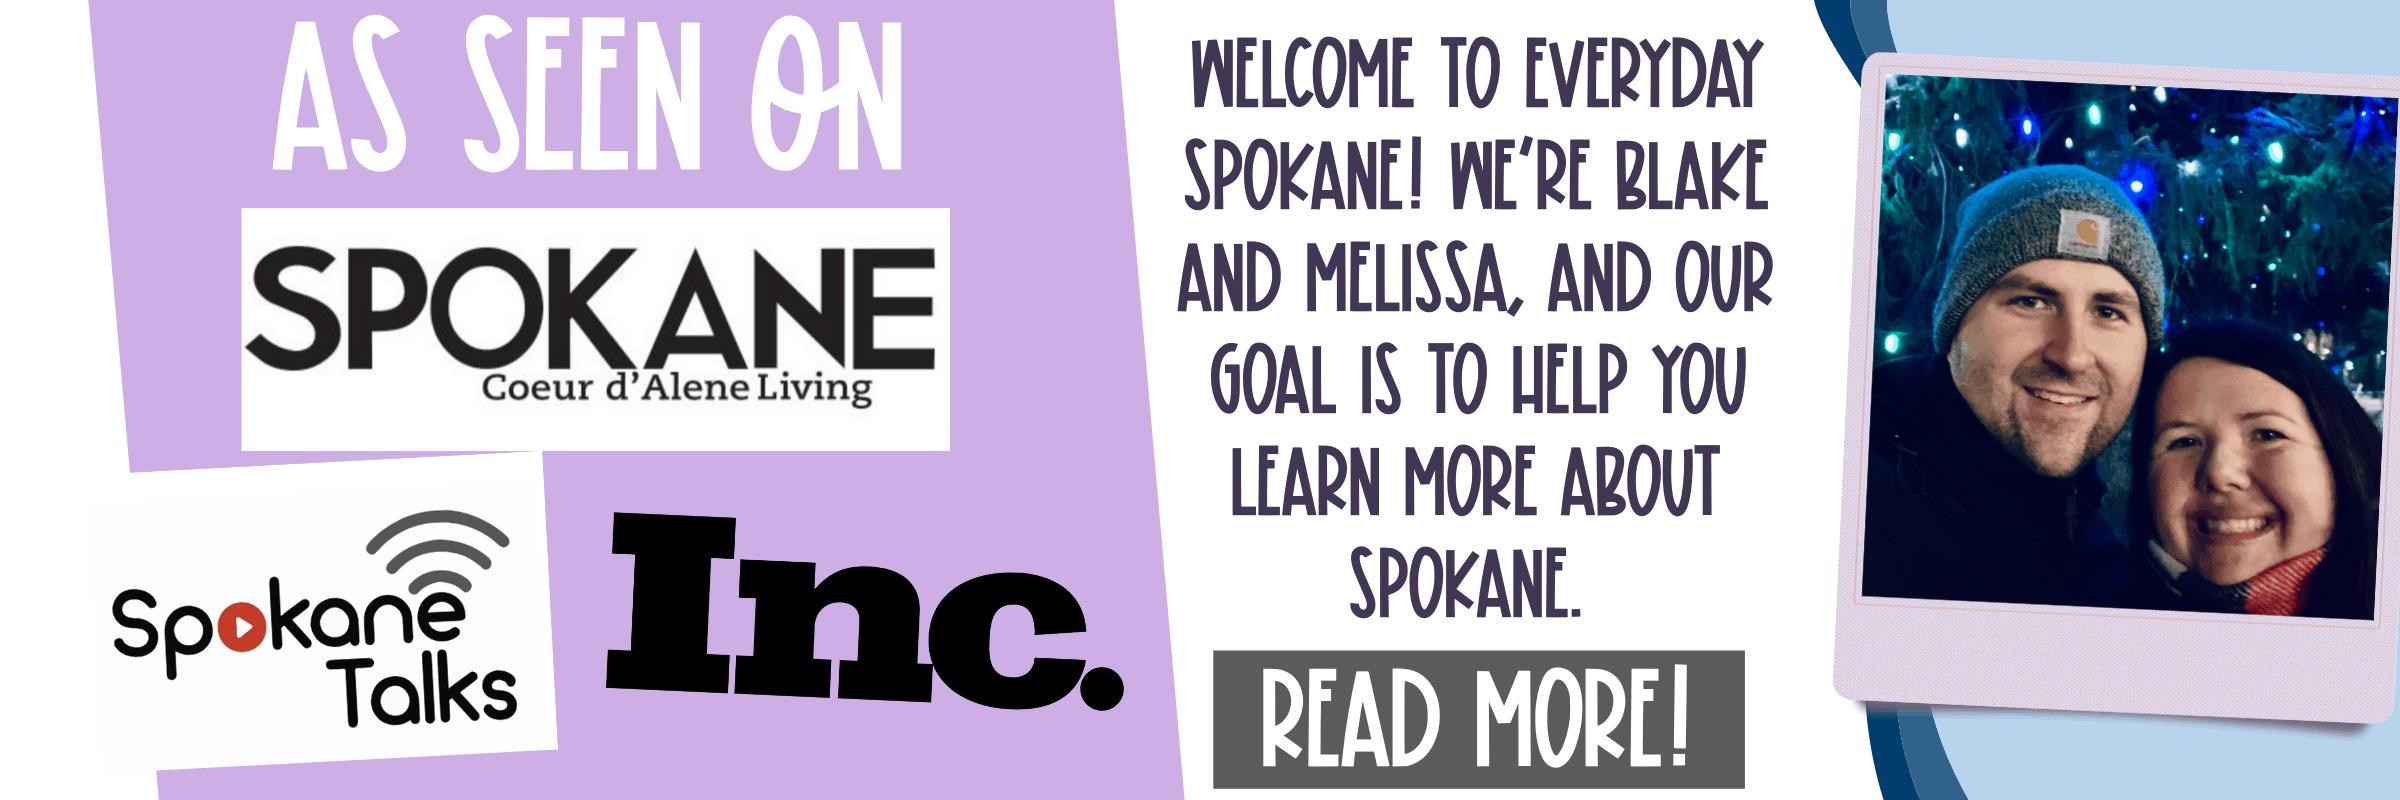 about everyday spokane